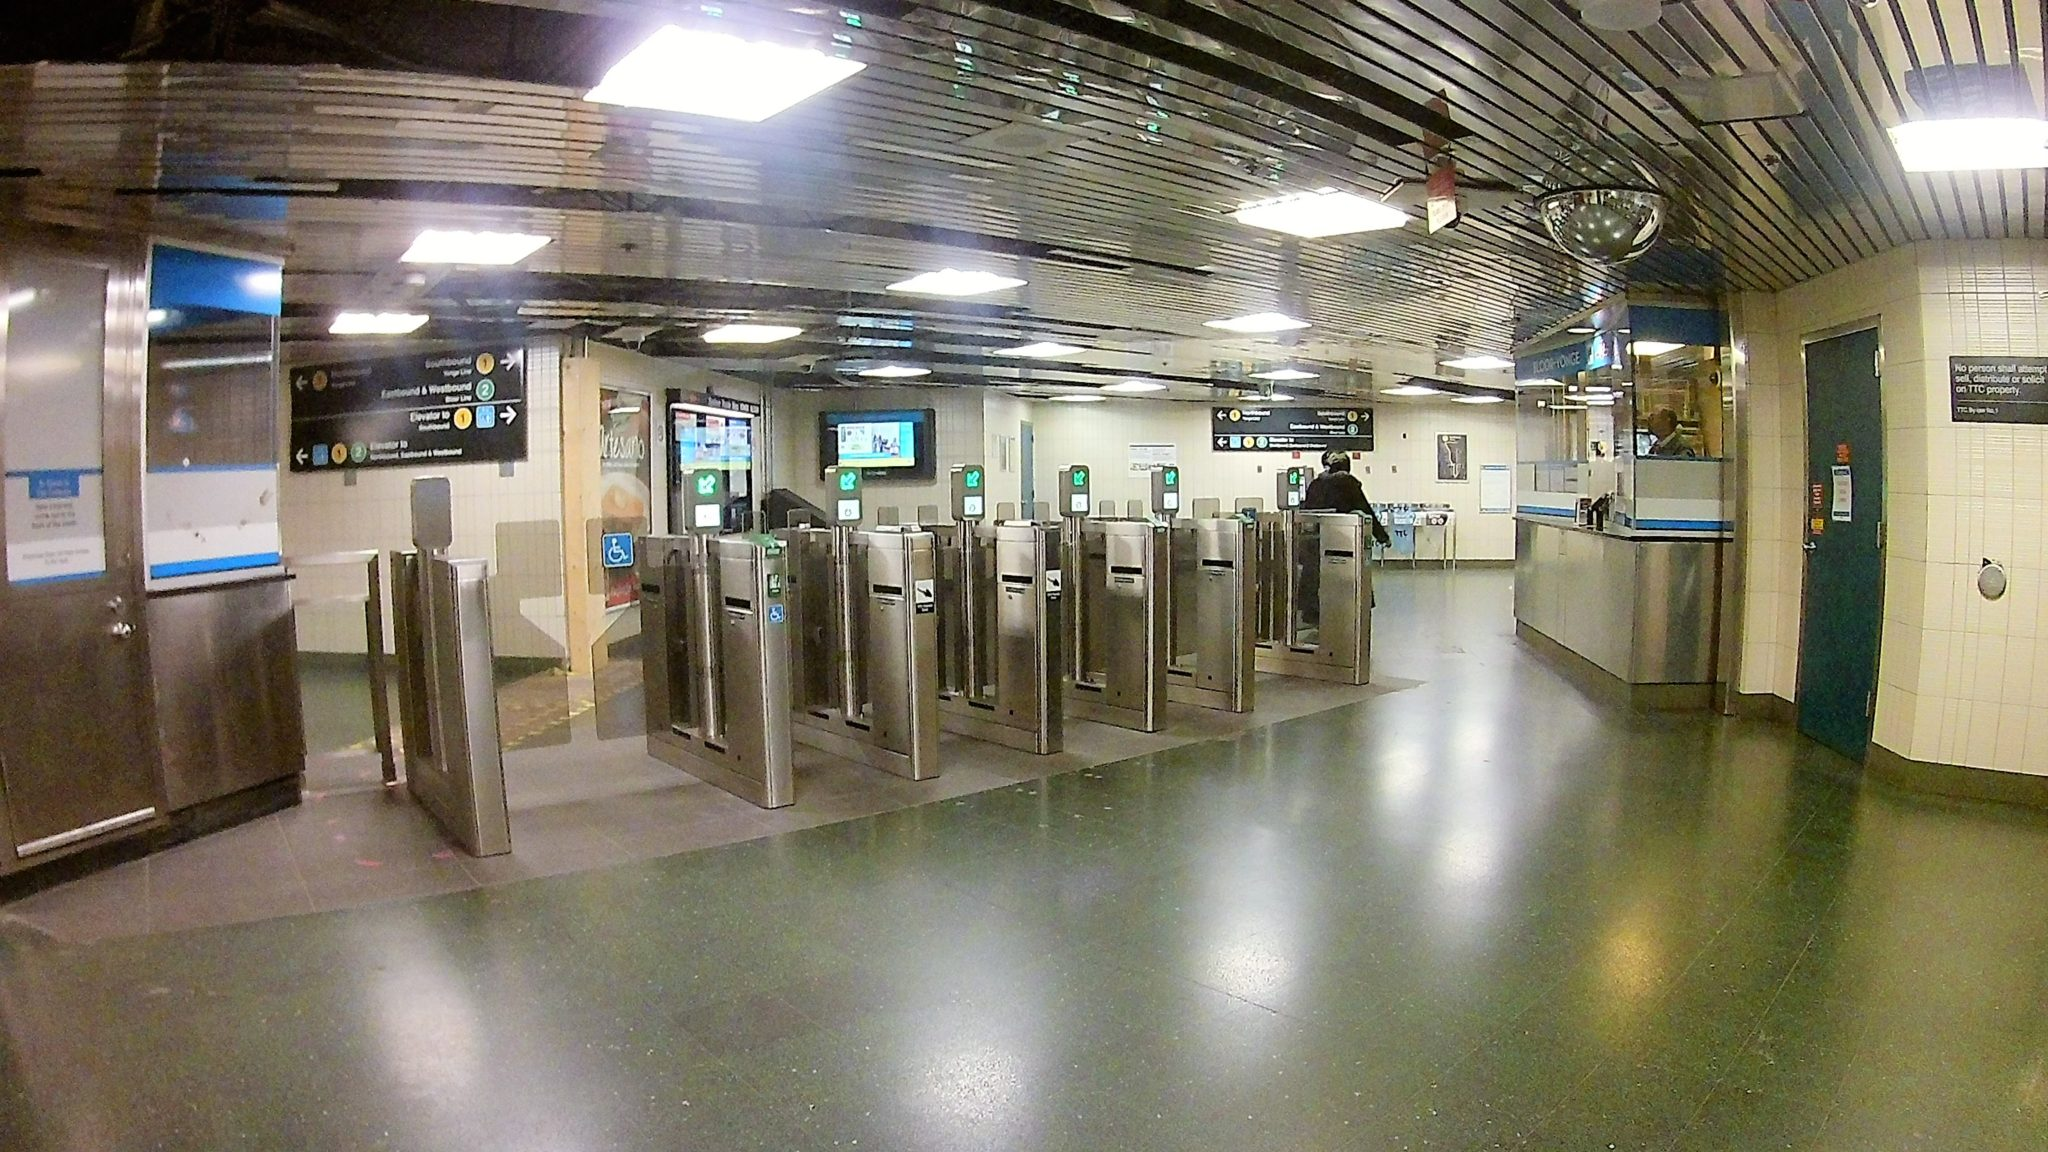 Photo of Toronto subway system.